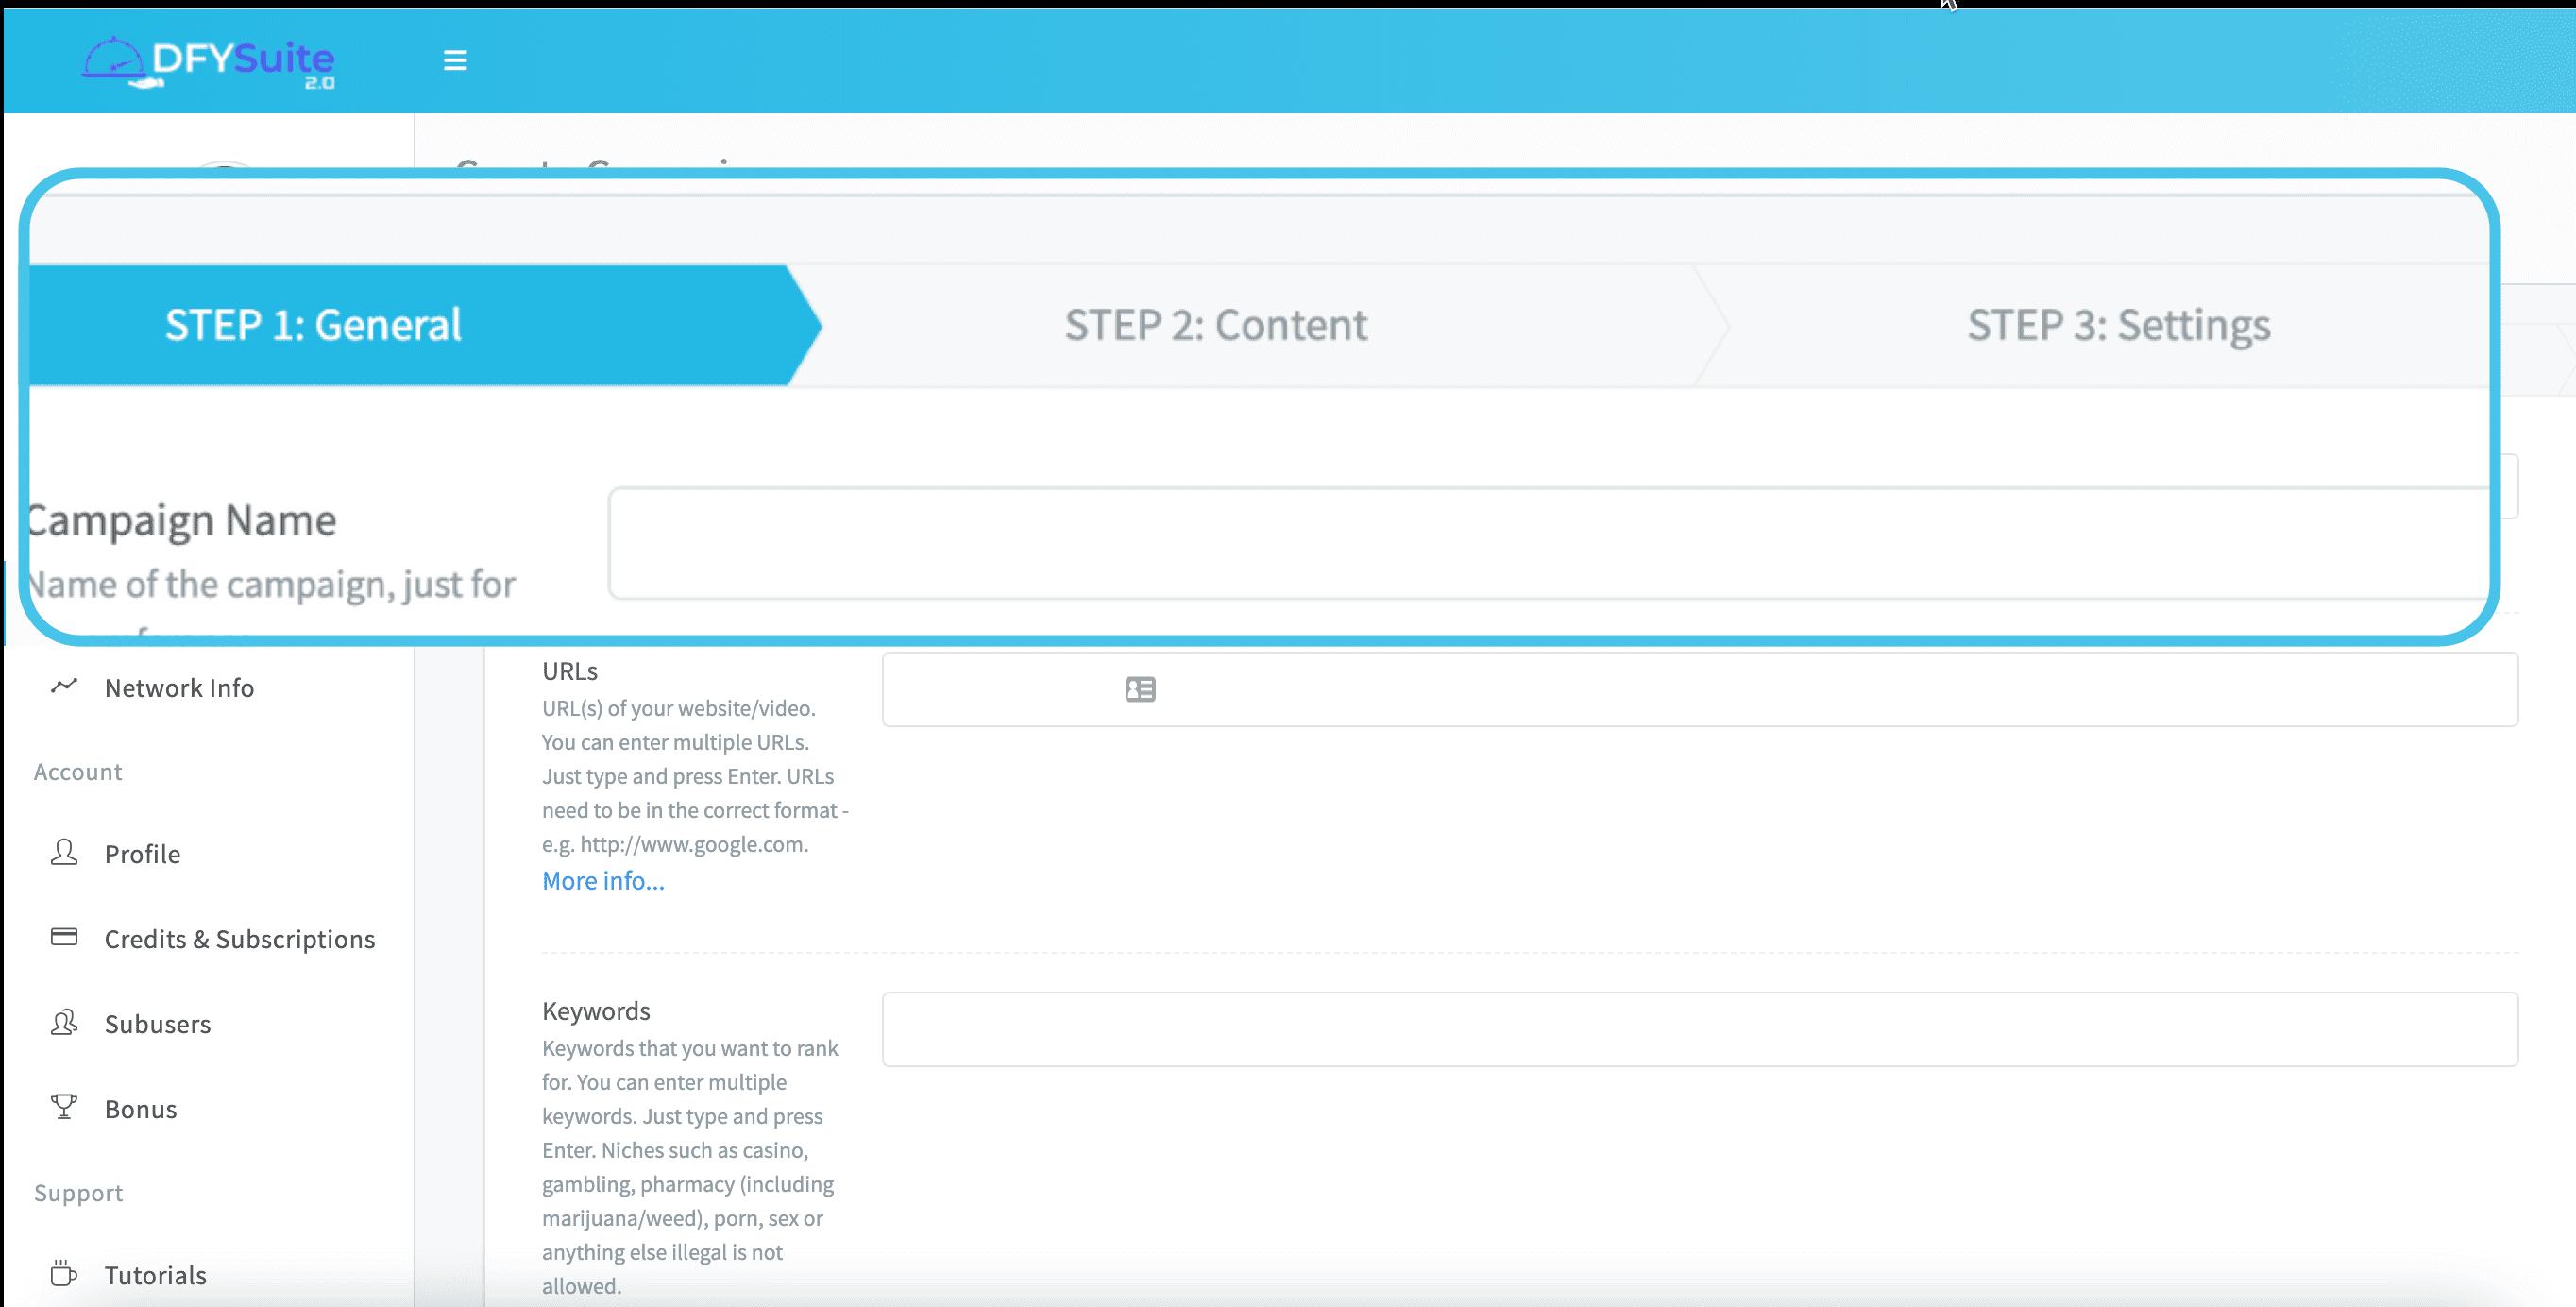 DFY-Suite-3-feature